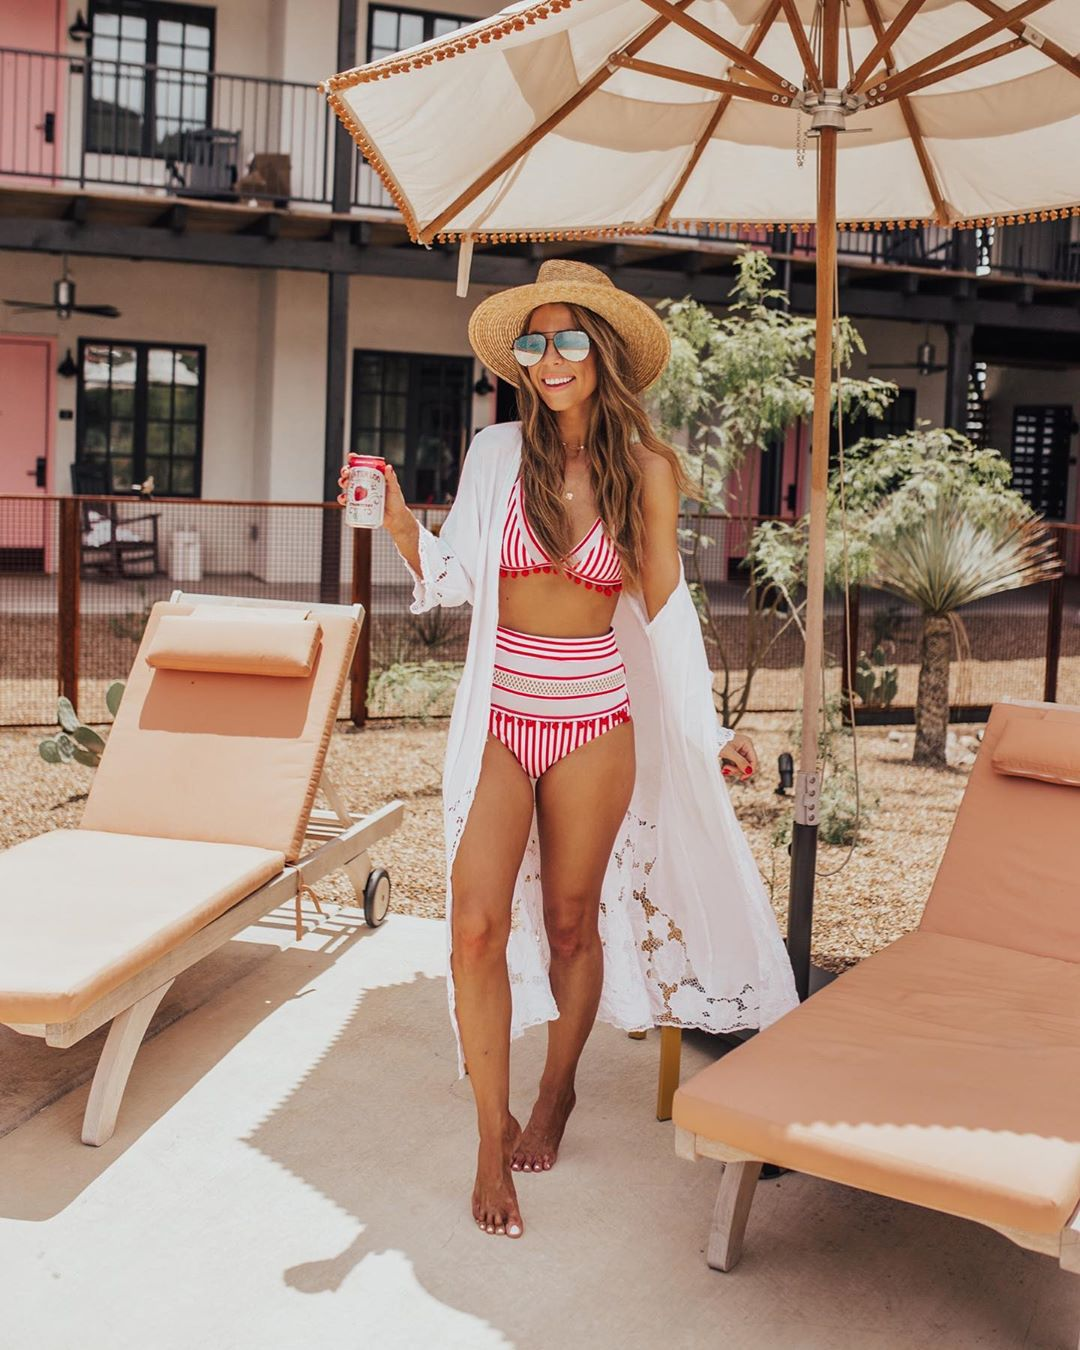 dress cover up swimwear two piece stripes bikini top bikini bottoms high waisted hat